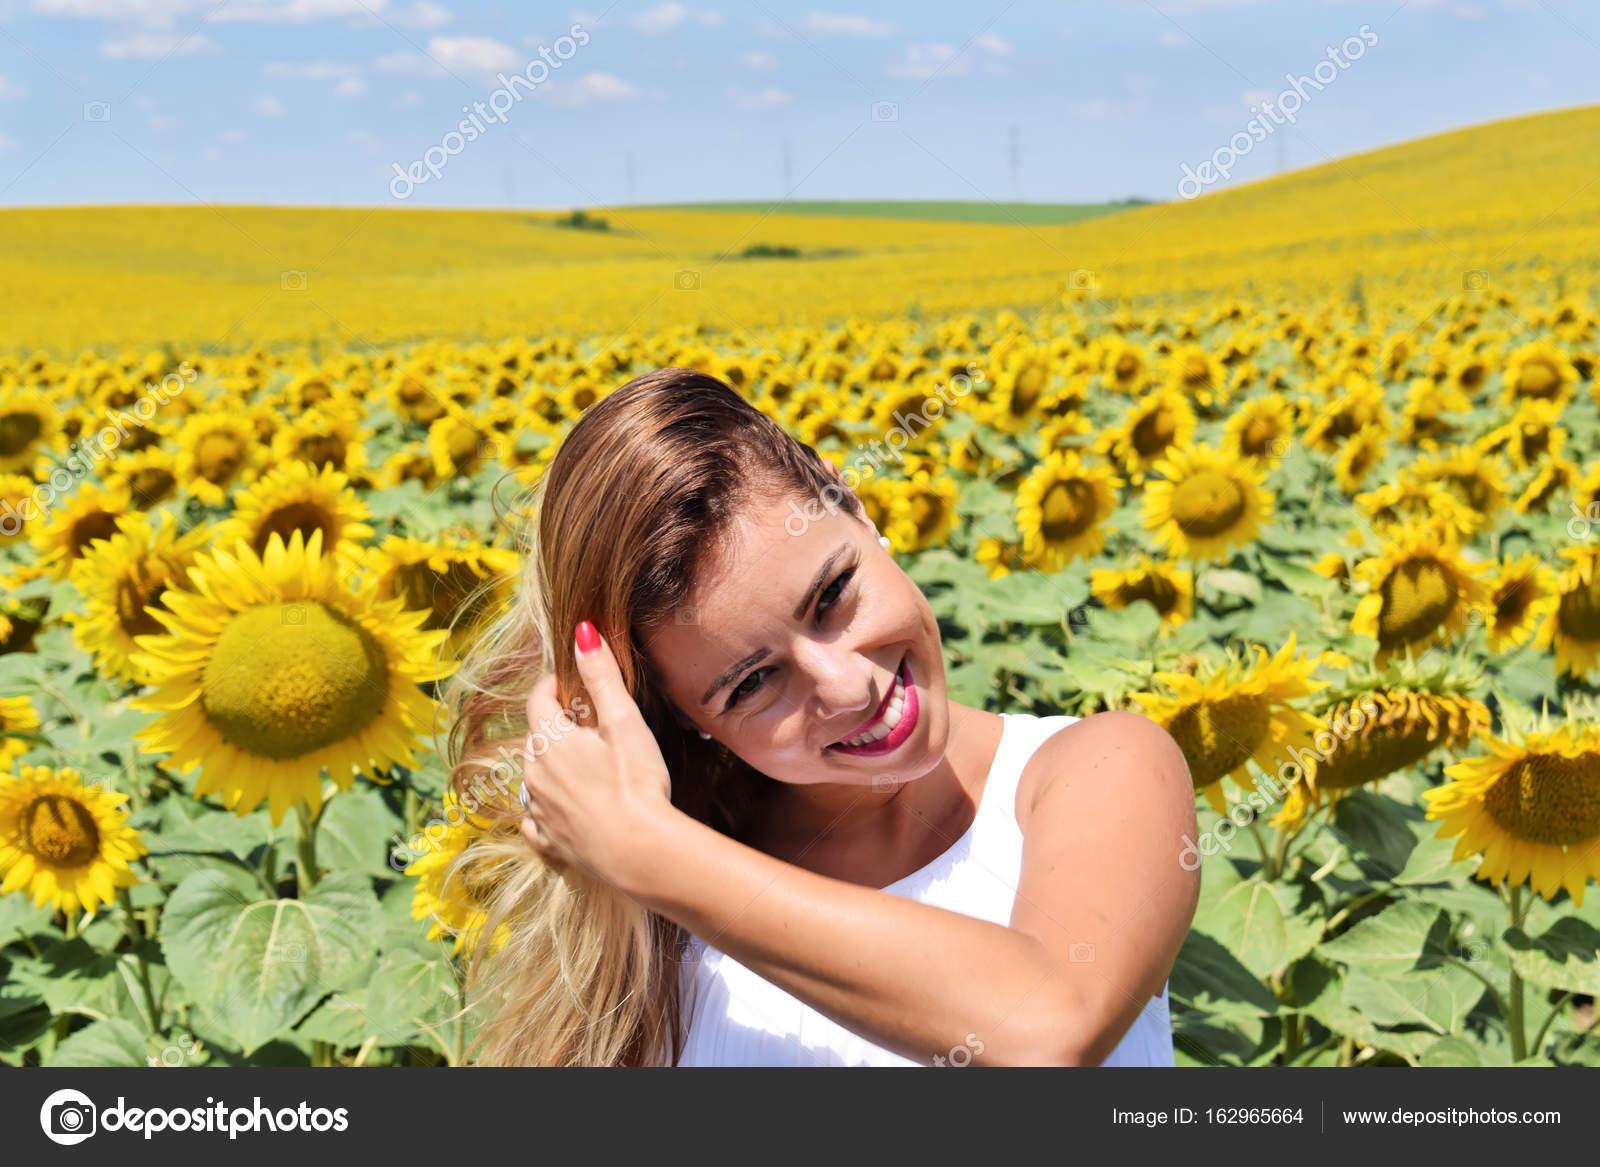 Topic, interesting cute teen girl in farm share